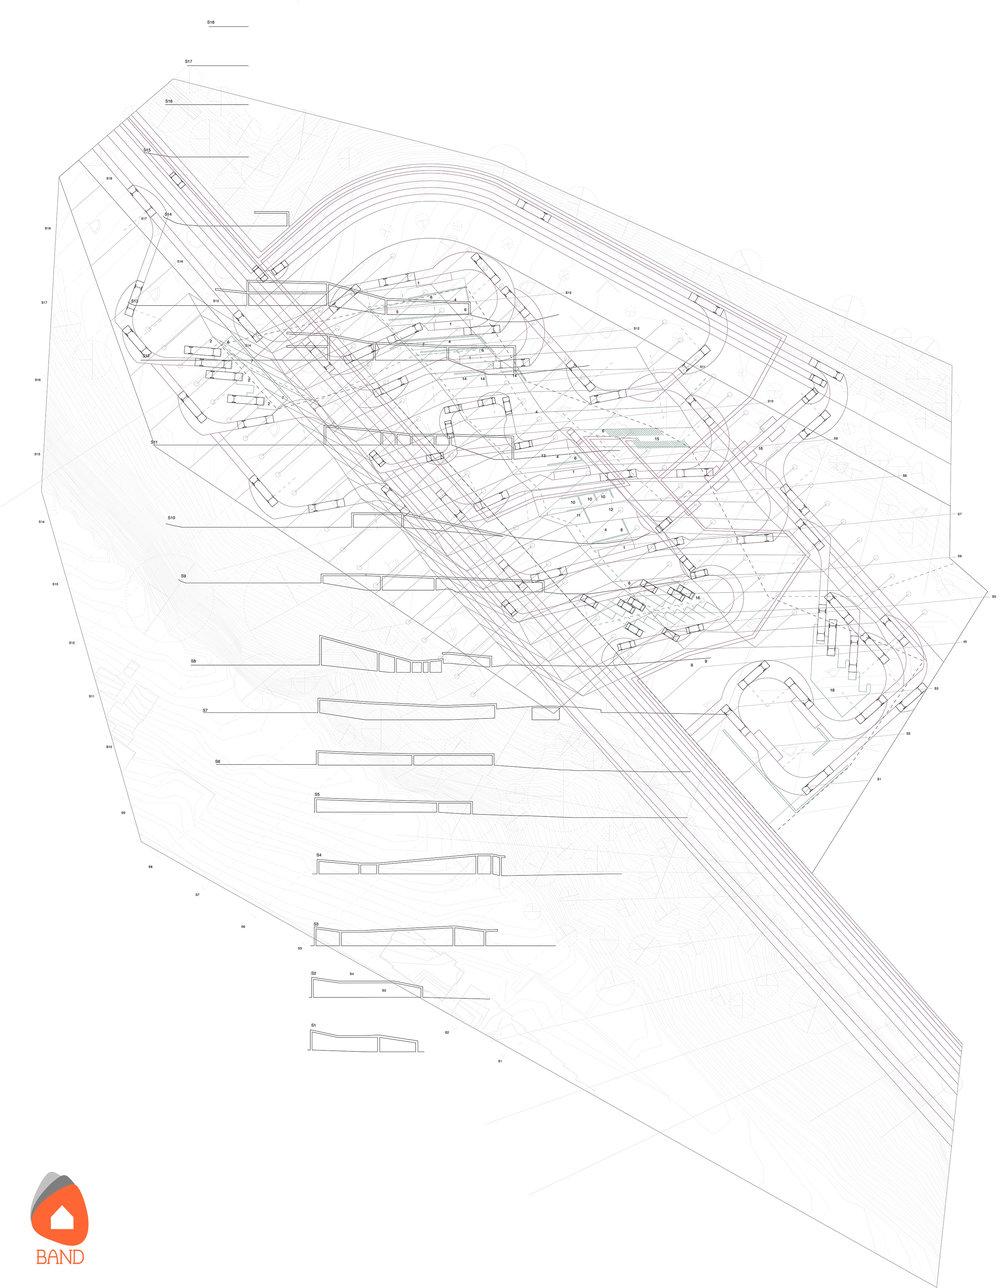 Vish_Site analysis.jpg